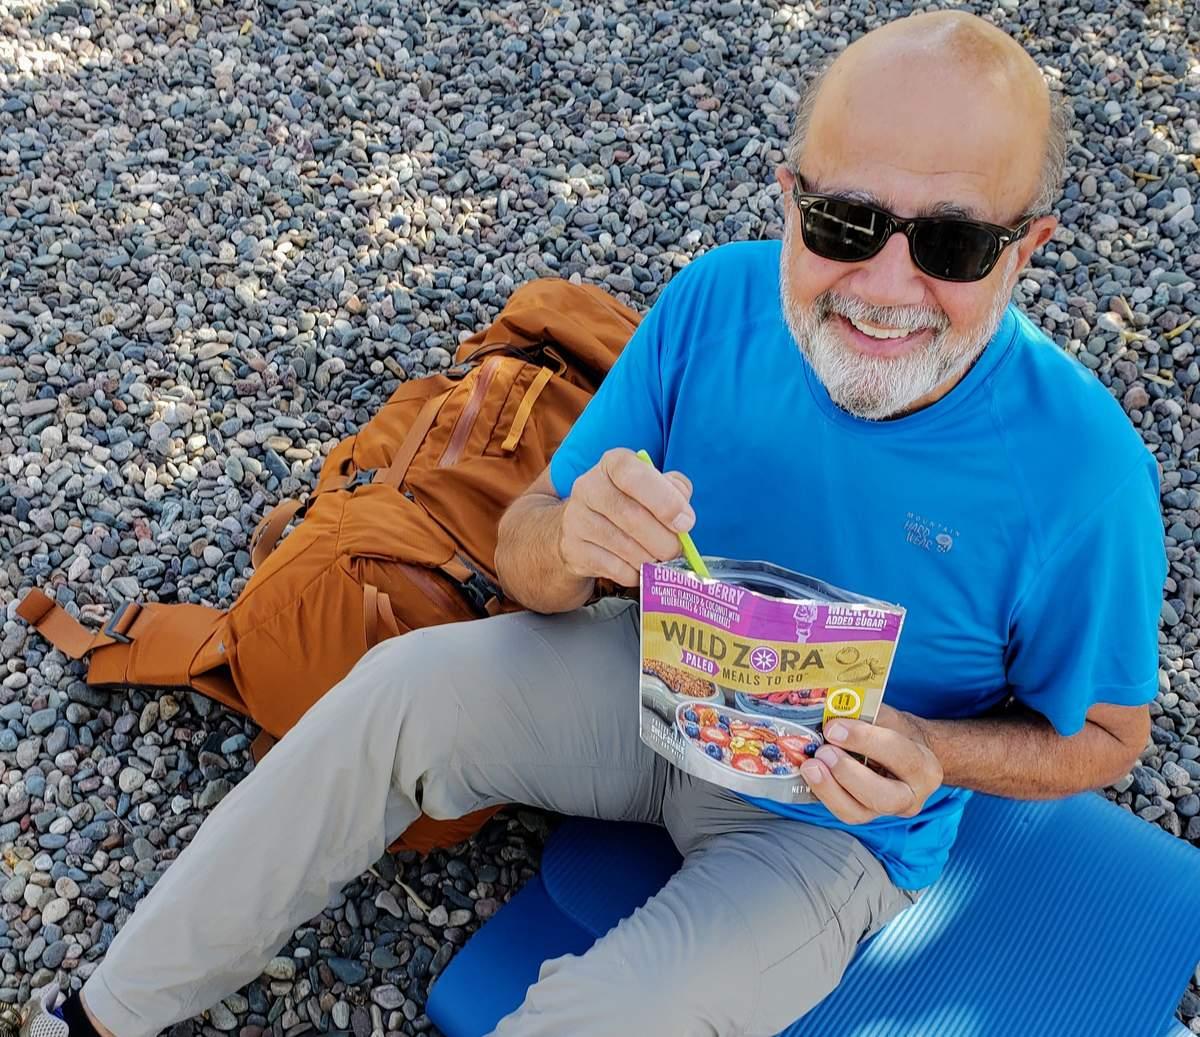 man sitting on ground eating food